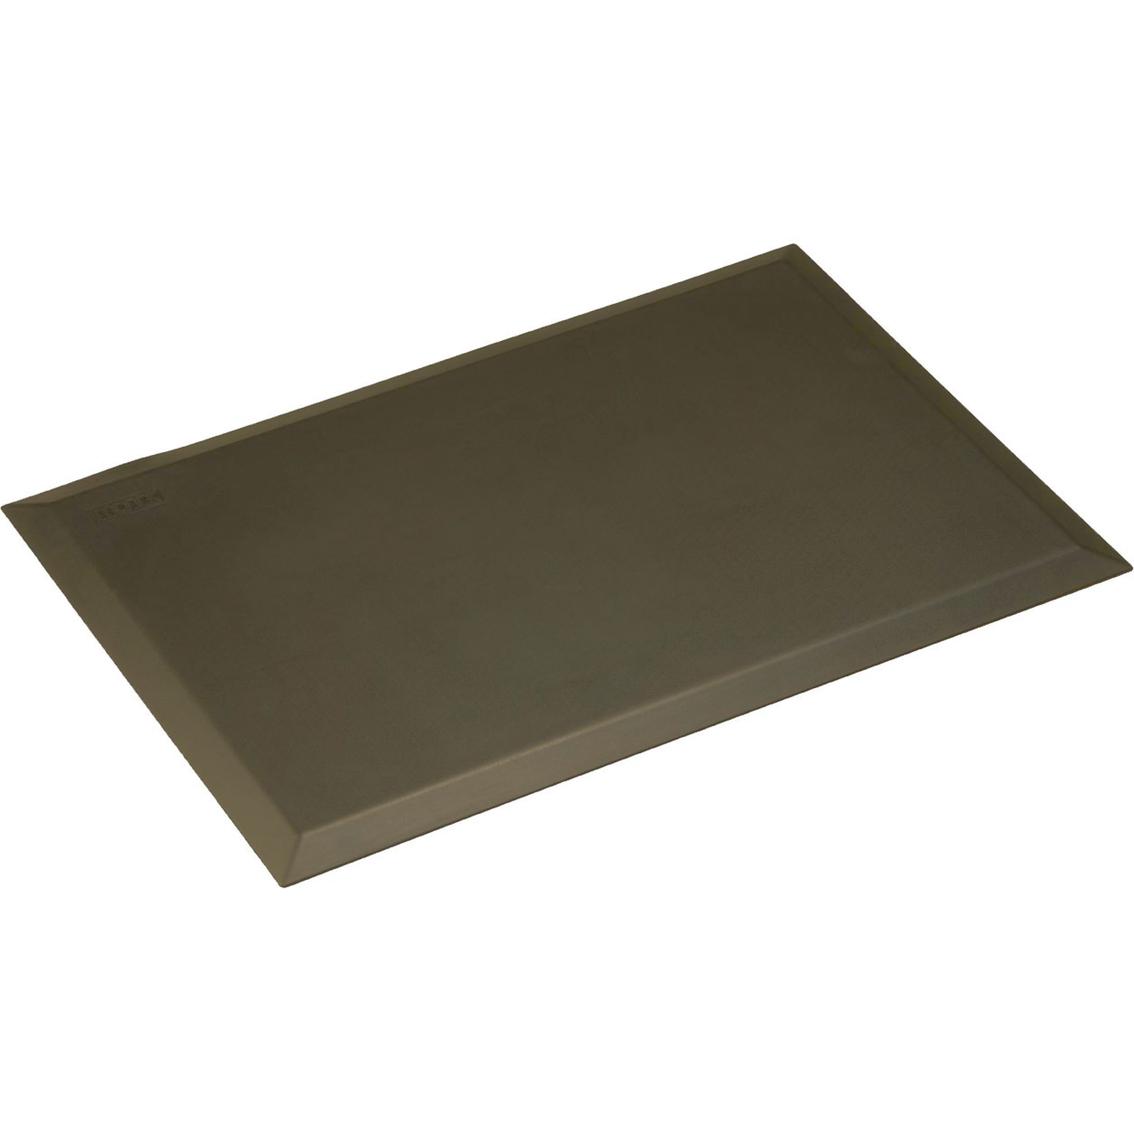 Imprint Anti Fatigue Professional Series Mat Door